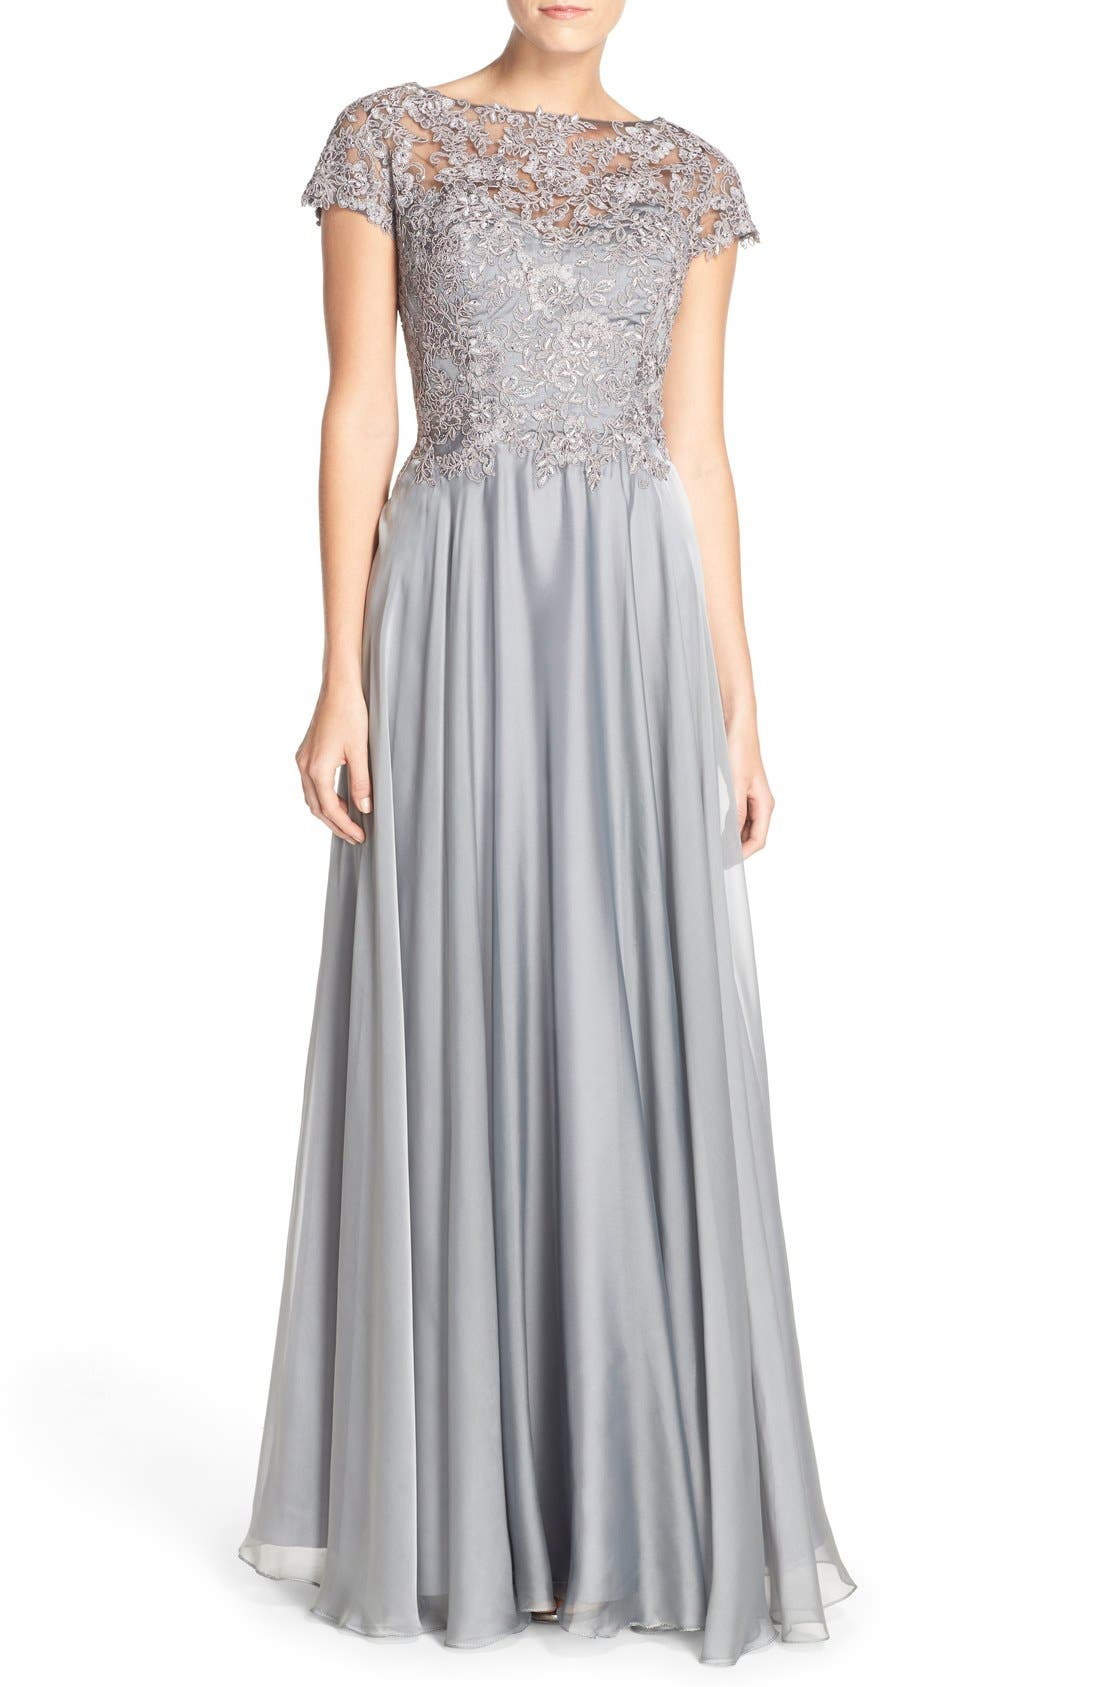 LA FEMME Embellished Lace & Satin Ballgown, Main, color, PLATINUM